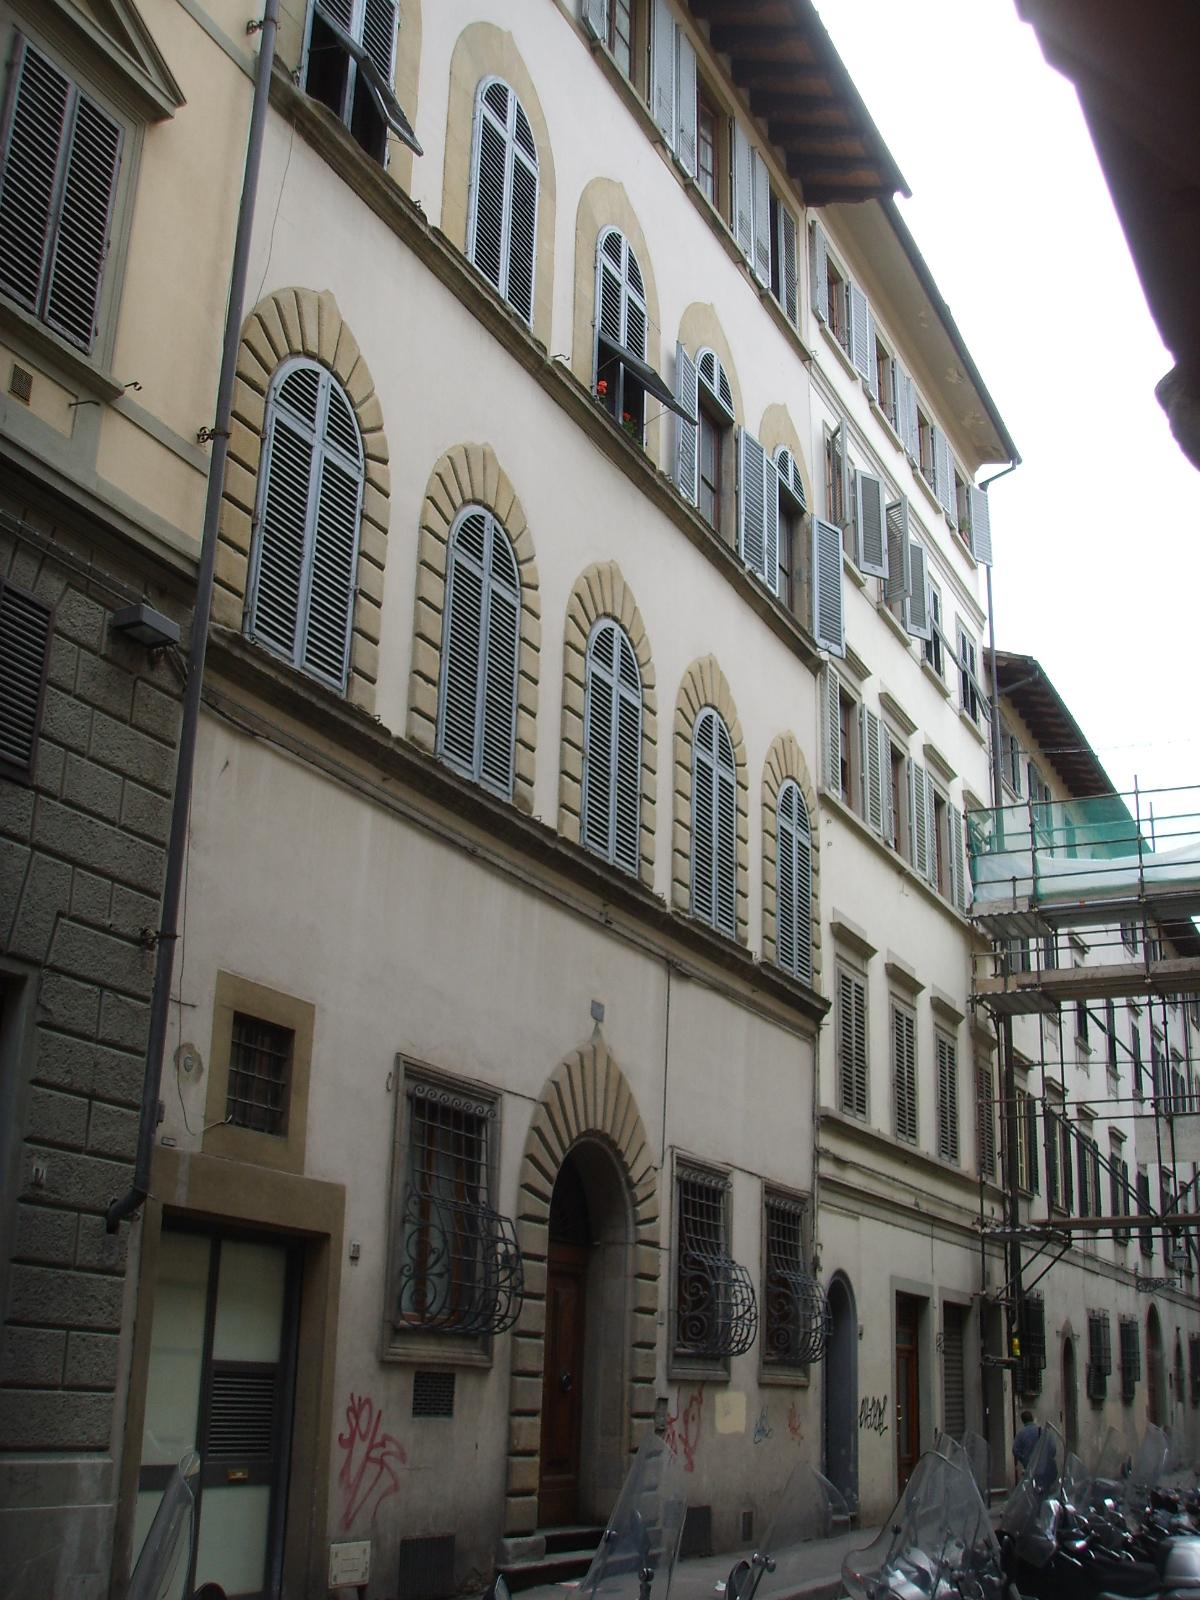 Palazzo Corsi-Albizi - Wikipedia